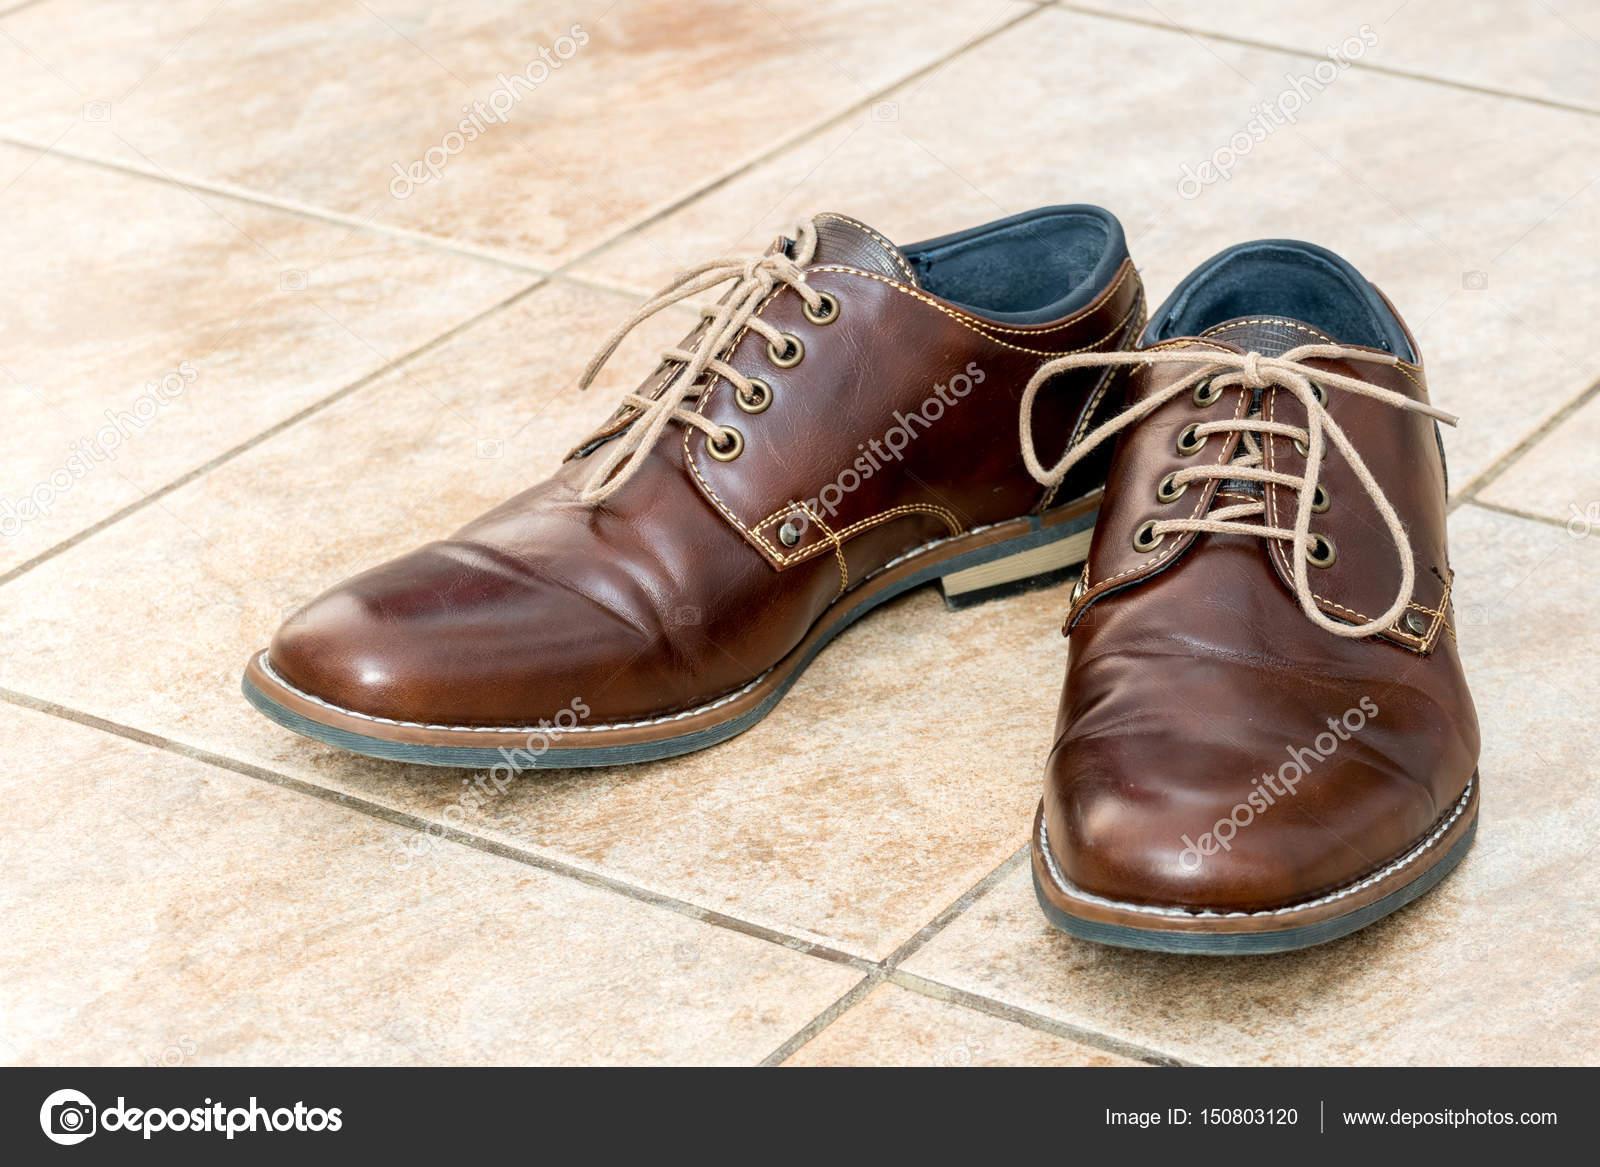 new products d8919 a71cc Mode braun Leder Herrenschuhe — Stockfoto © 2Ban #150803120